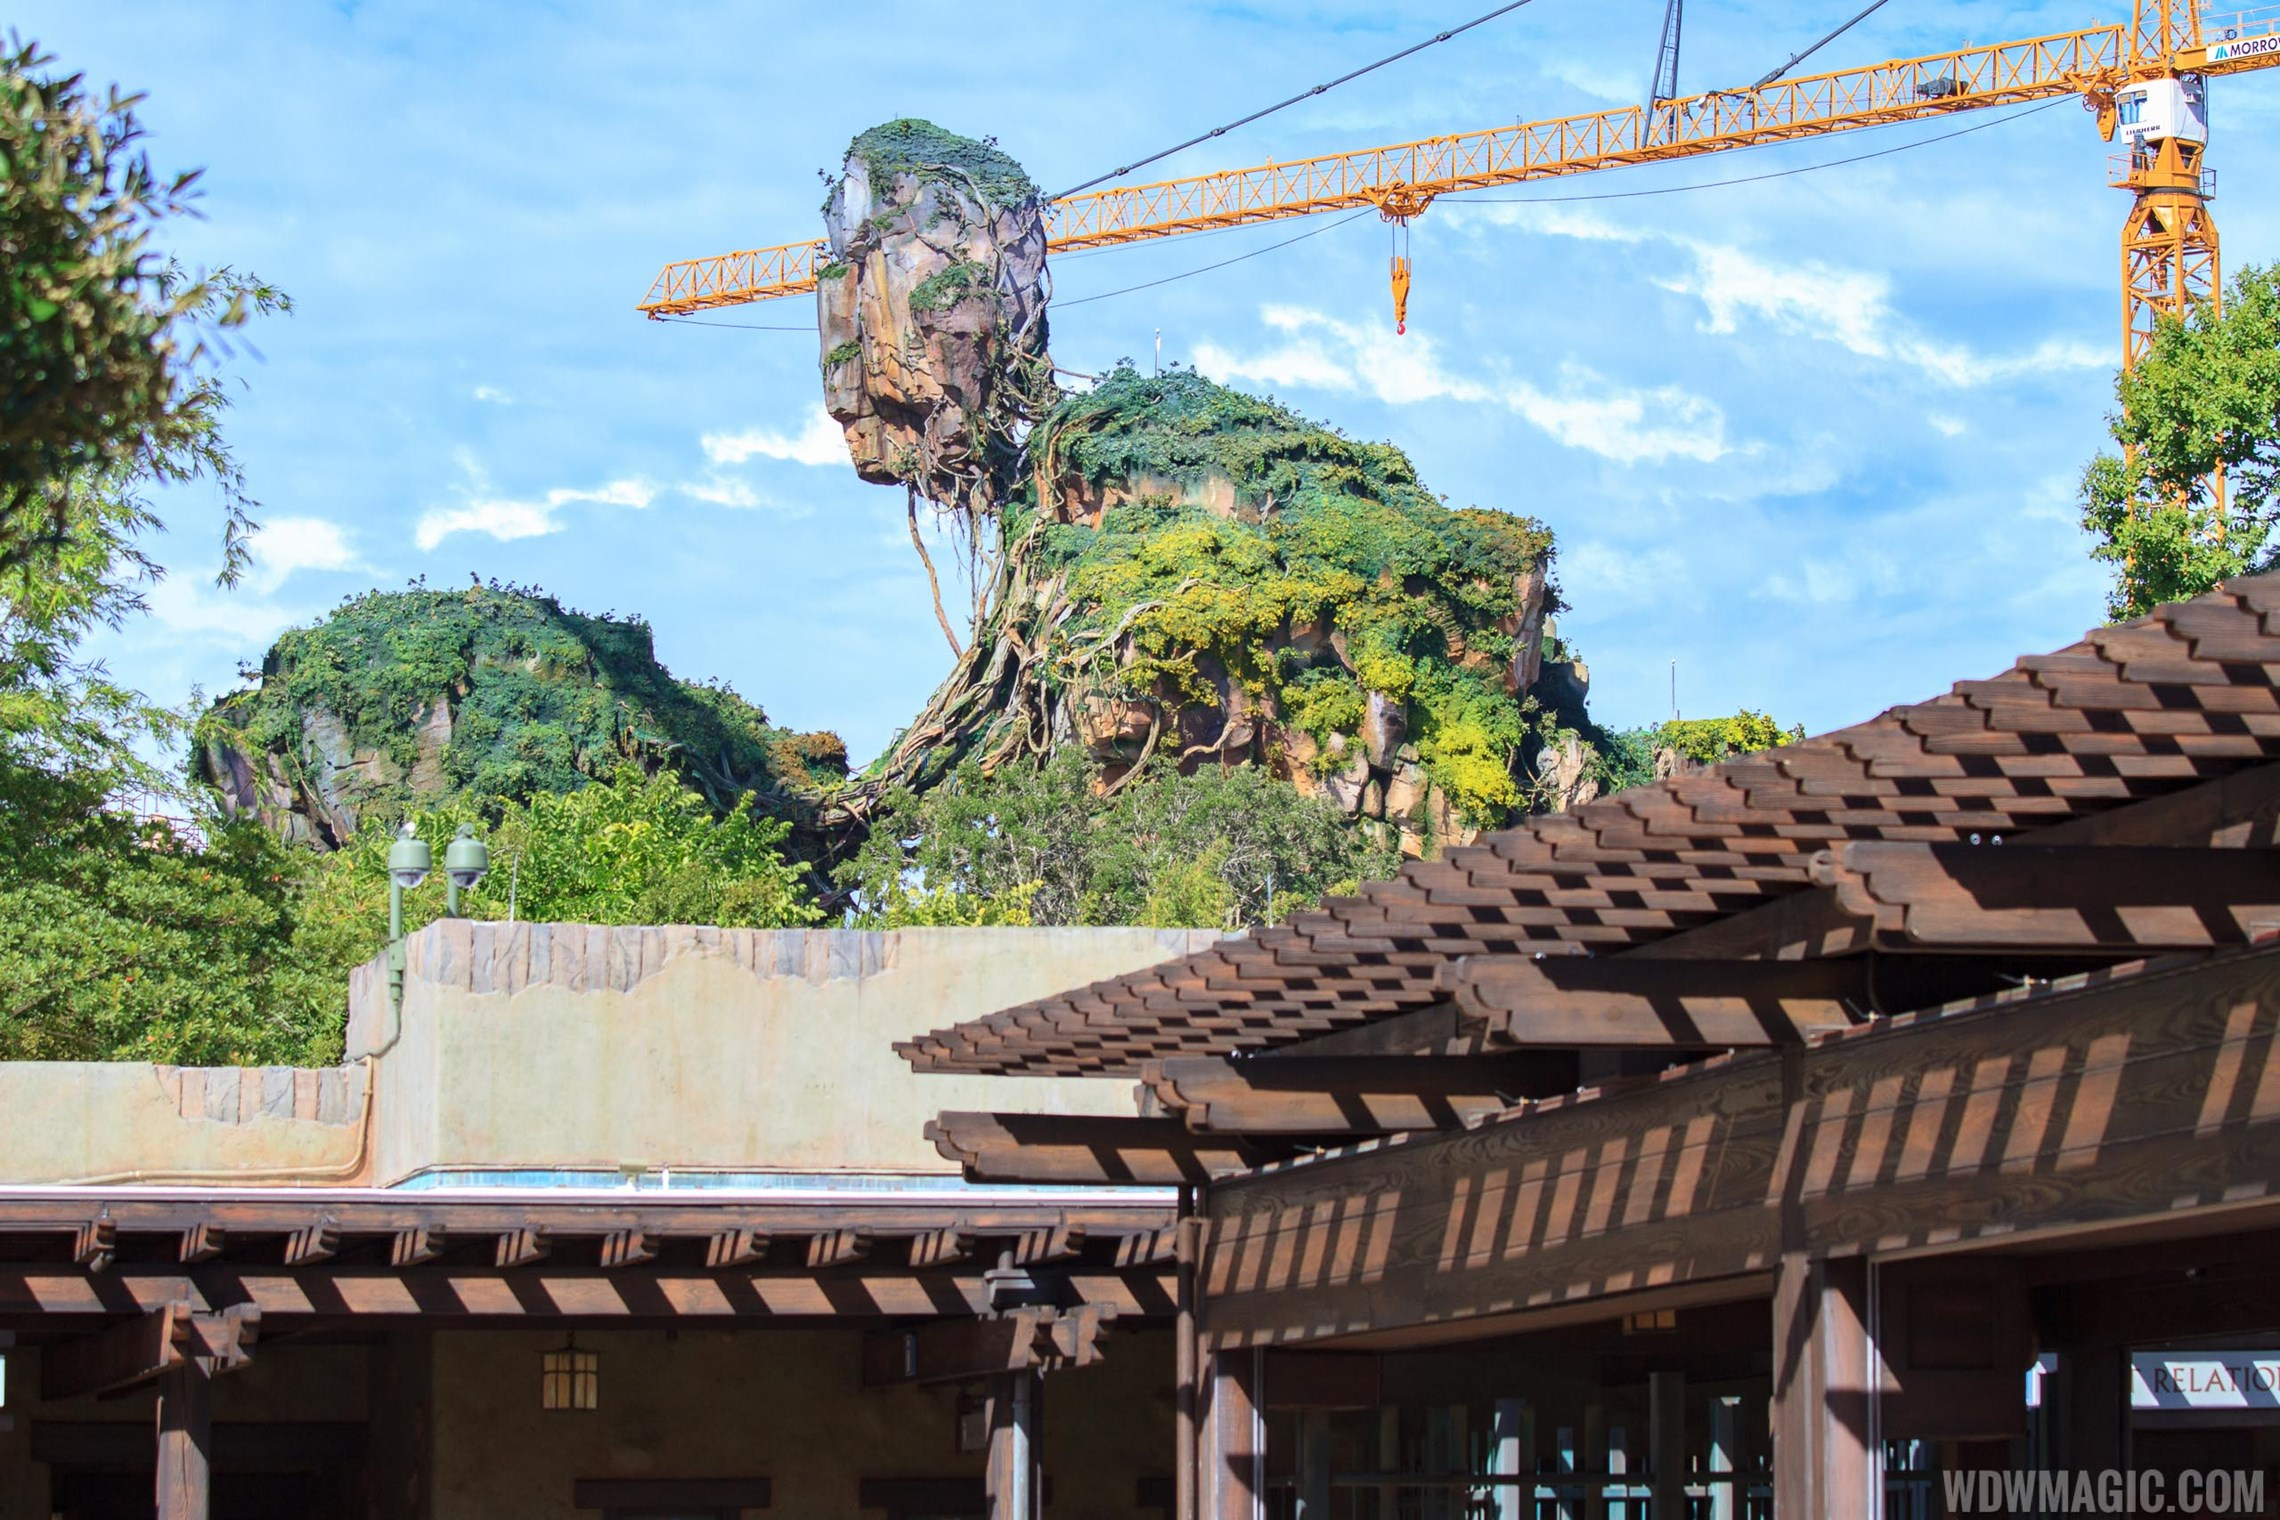 Pandora - The World of AVATAR construction